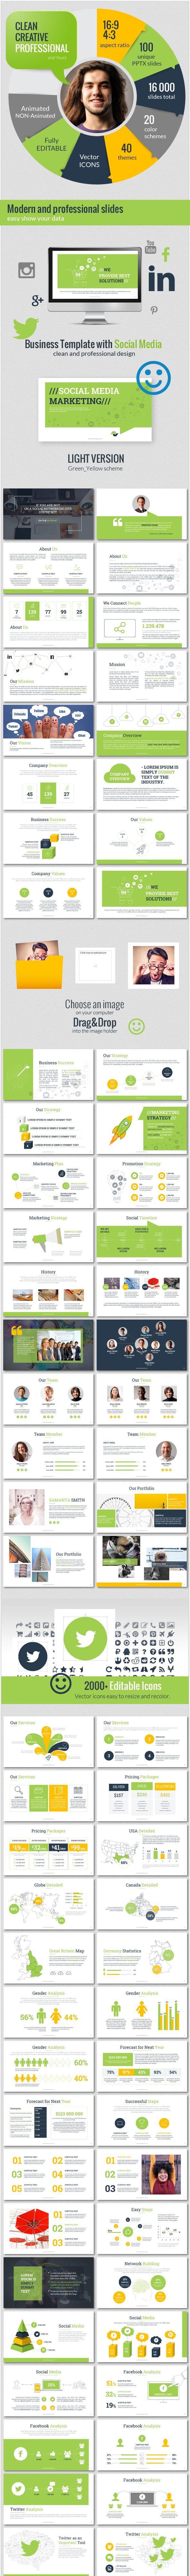 Social Media Deck Presentation Template - Business PowerPoint Templates